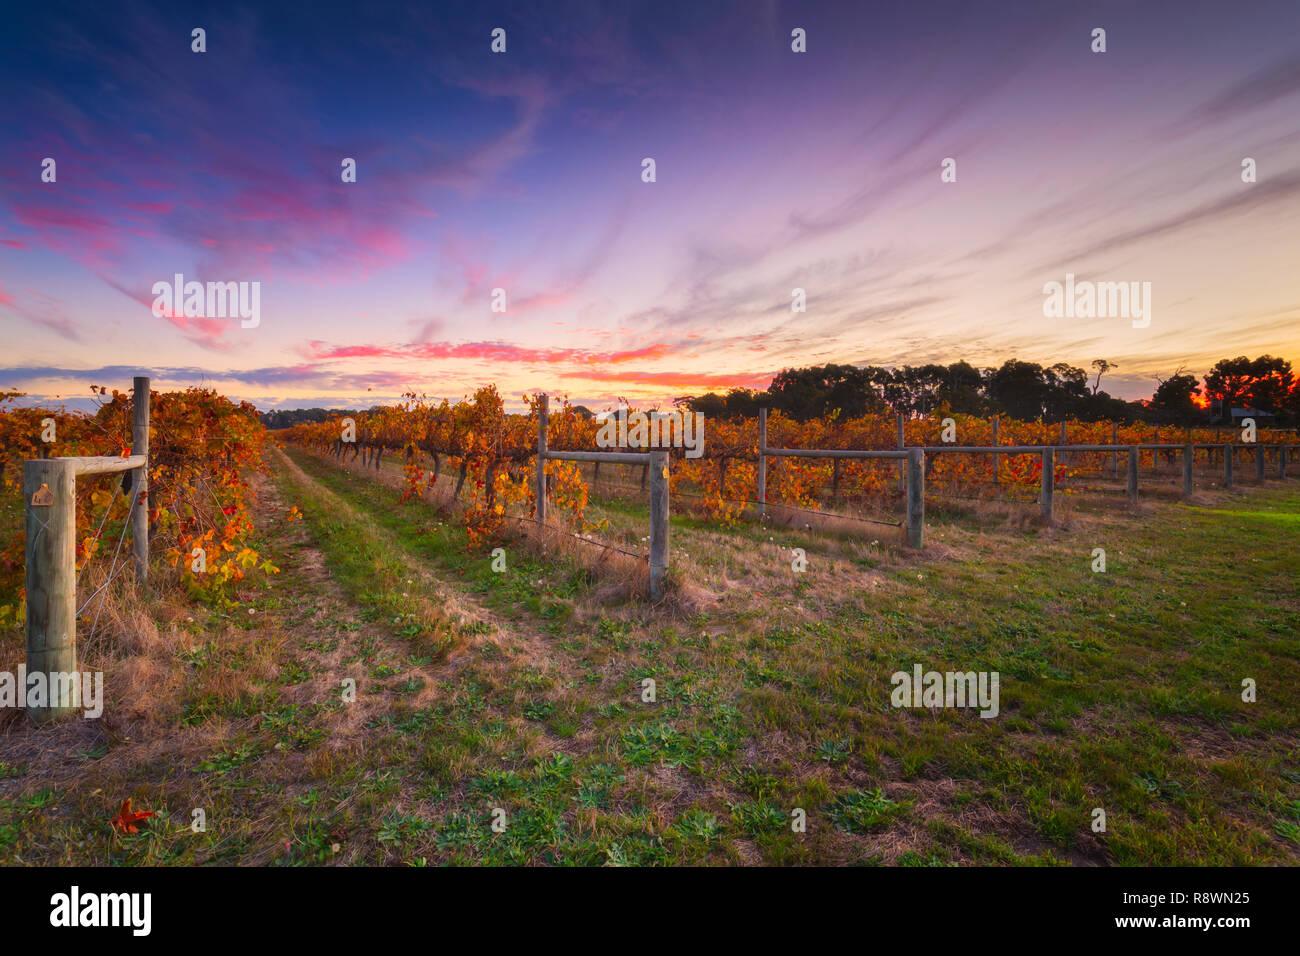 Fall Foliage In Winery - Stock Image